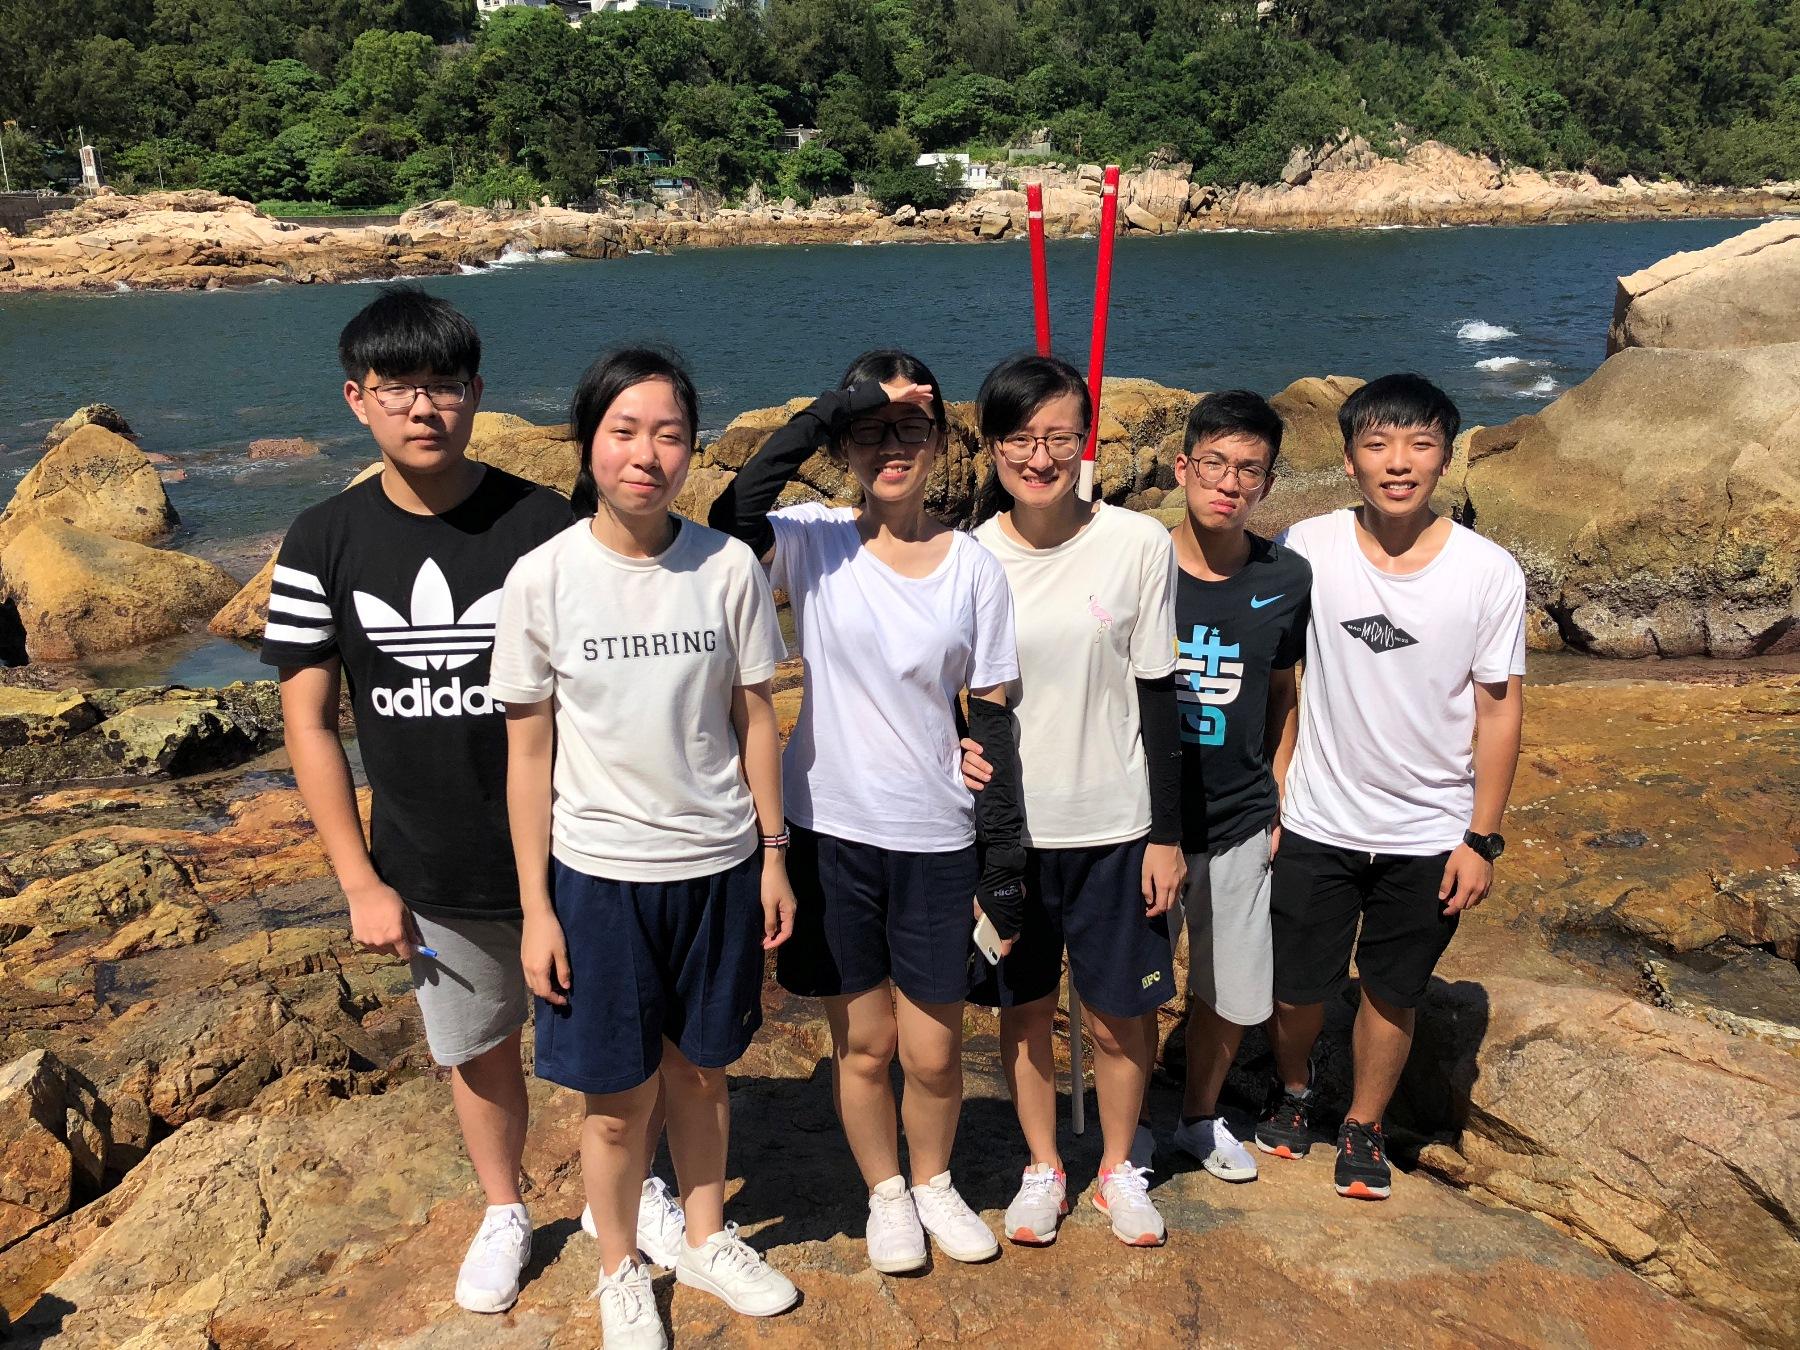 http://www.npc.edu.hk/sites/default/files/14_117.jpg